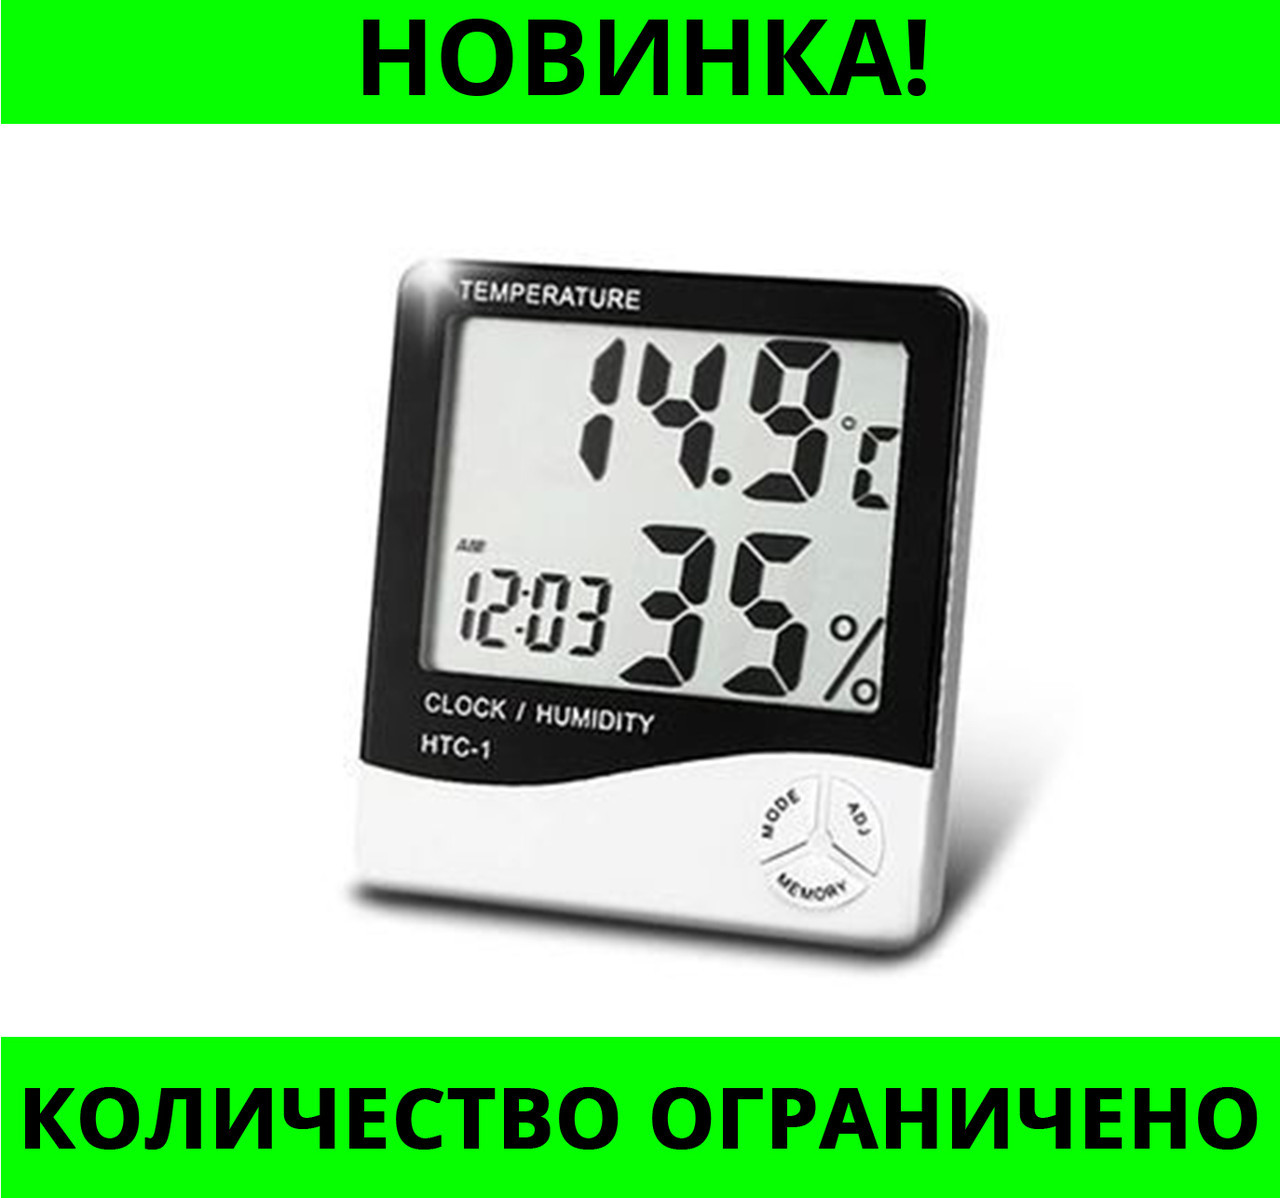 Цифровые часы HTC-1 гигрометр термометр!Розница и Опт